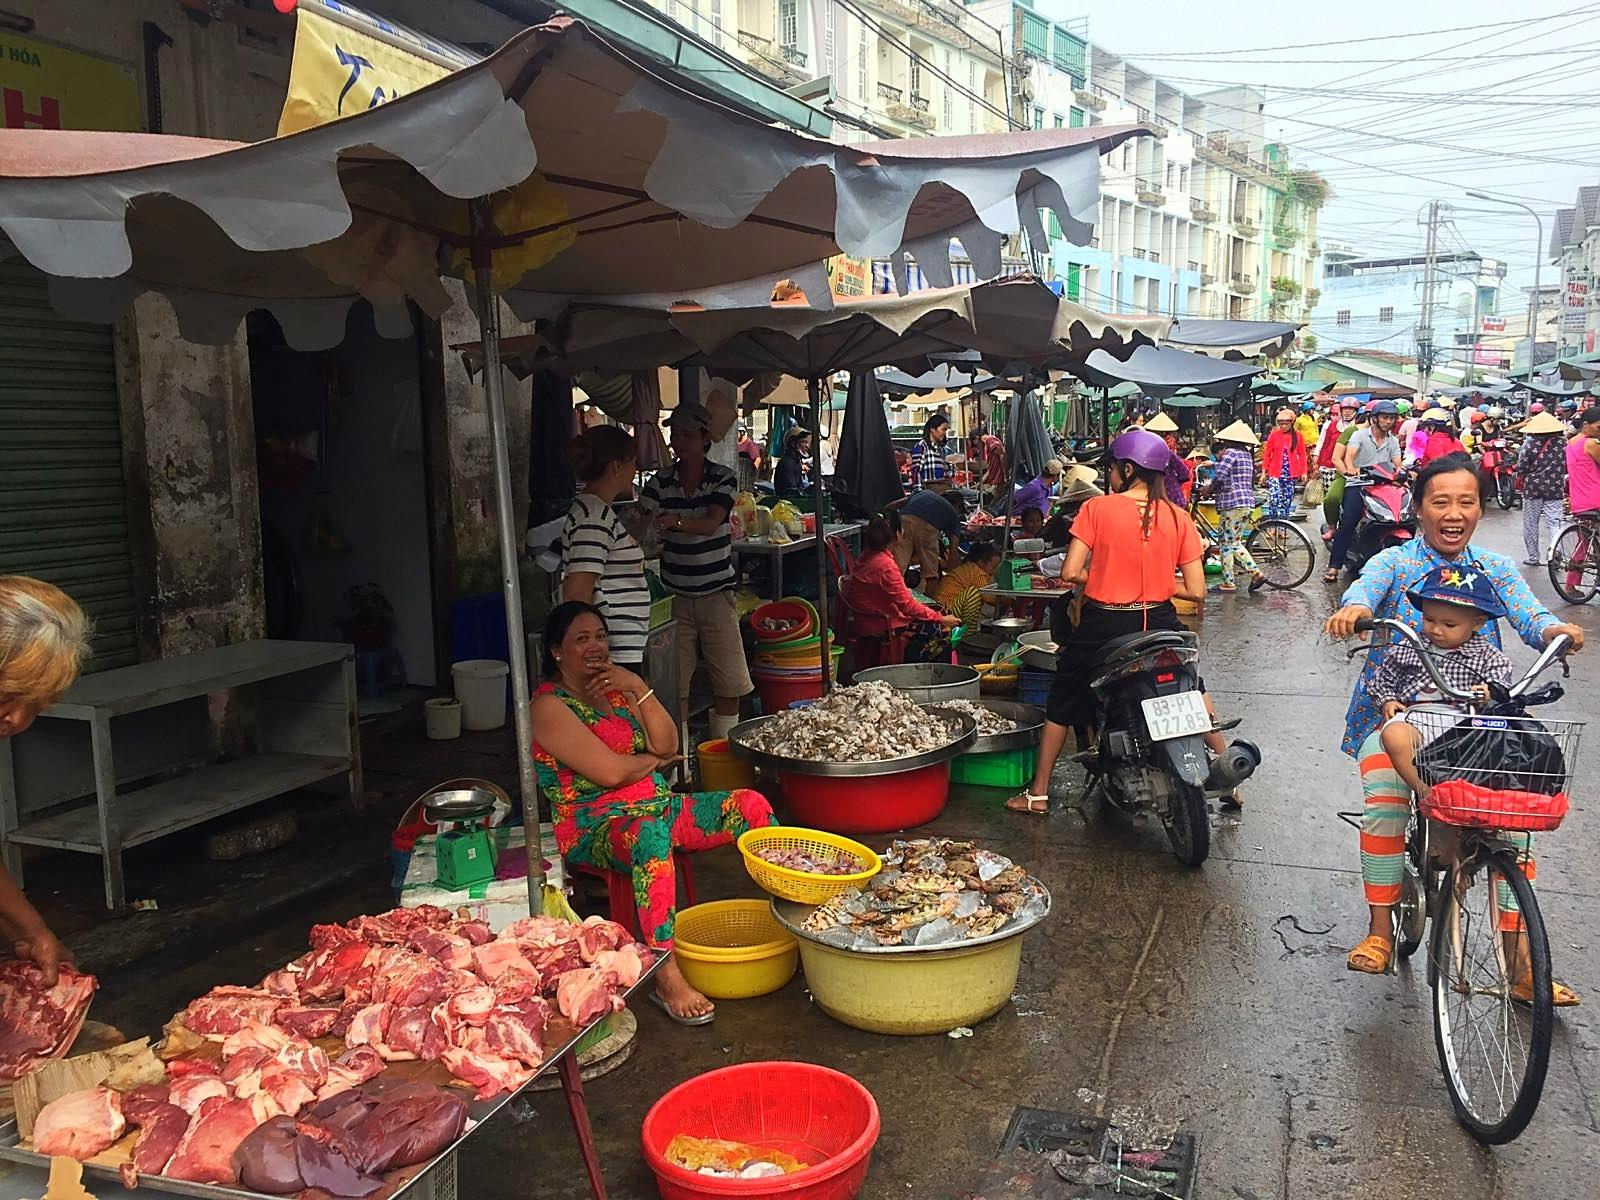 Der Markt in Soc Trang